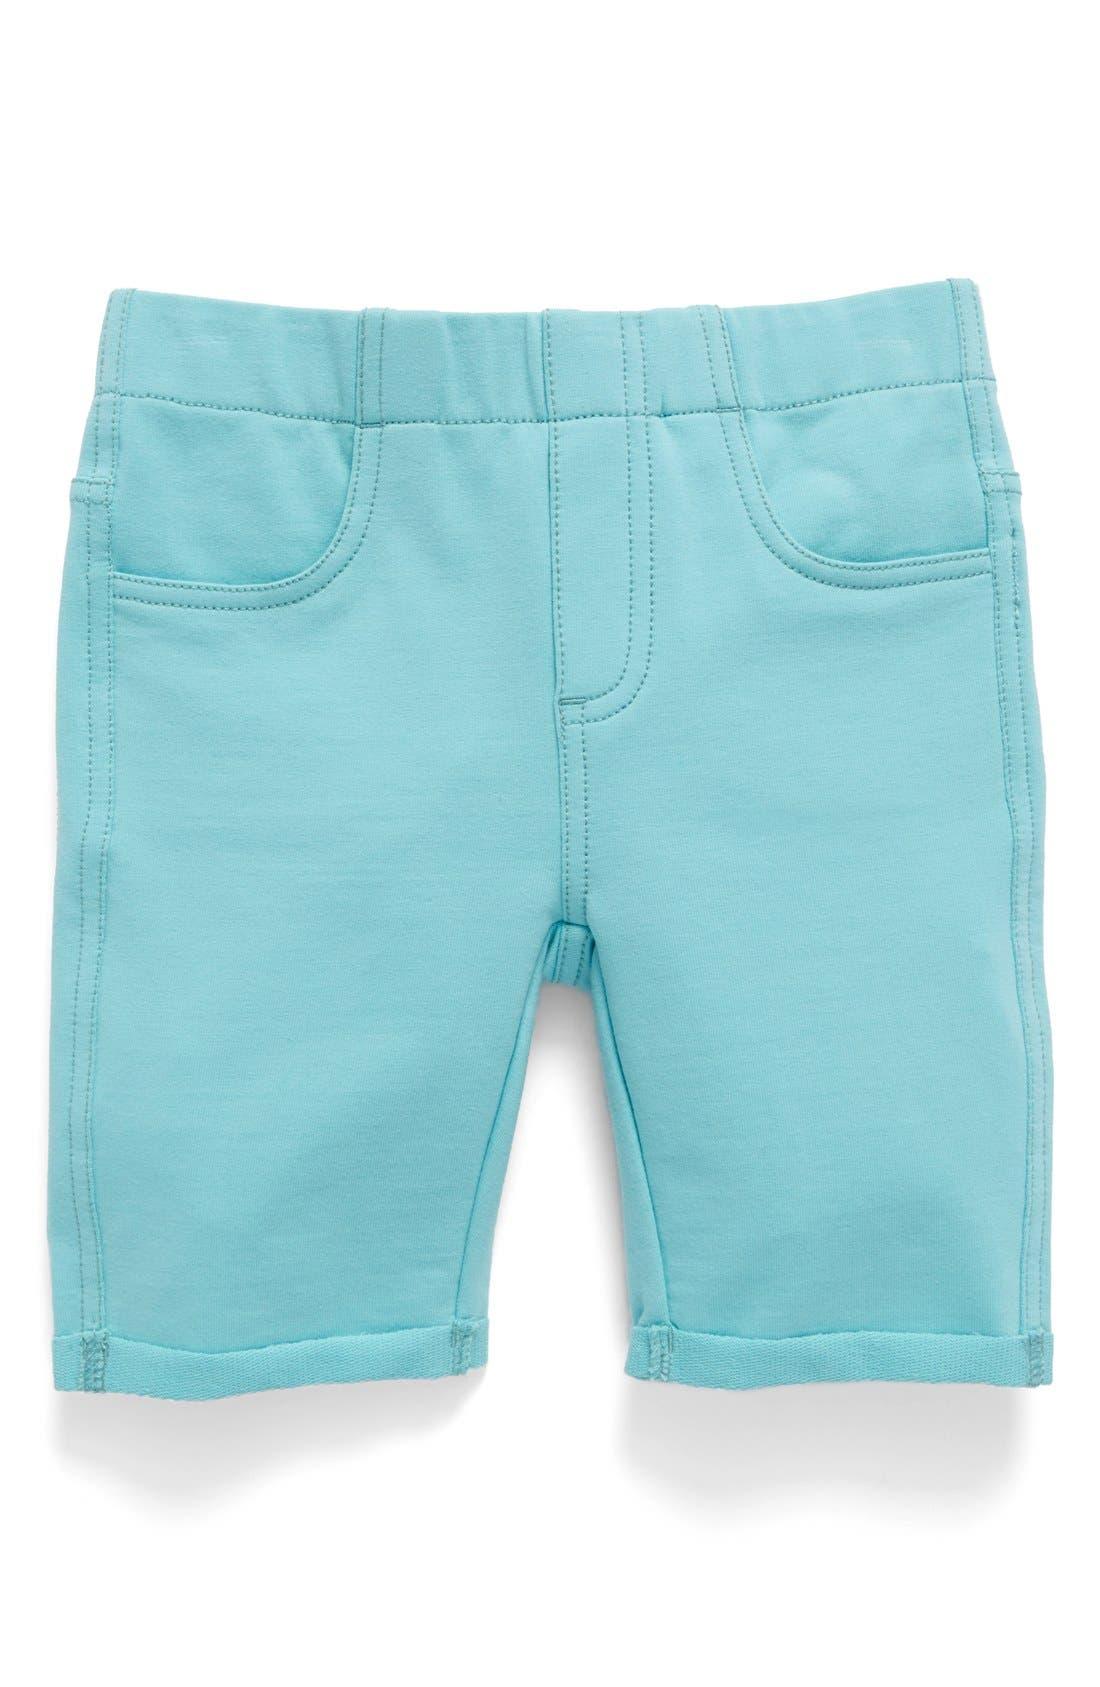 'Jenna' Jegging Shorts,                             Main thumbnail 8, color,